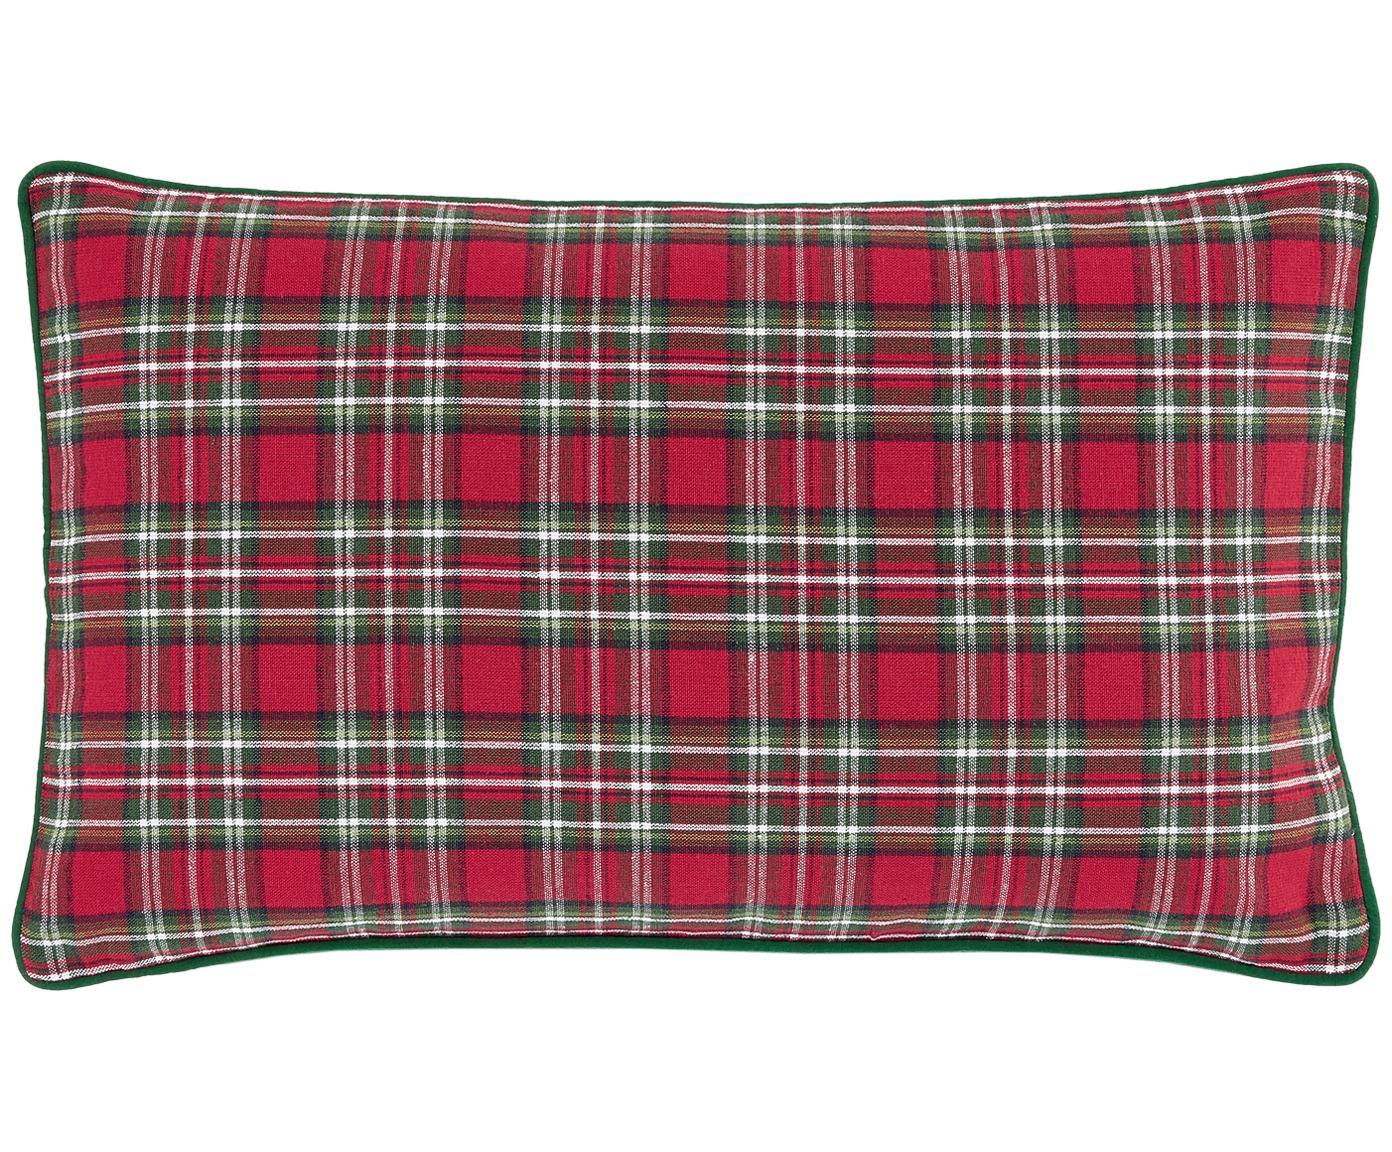 Kussenhoes Tartan, Katoen, Rood, donkergroen, 30 x 50 cm